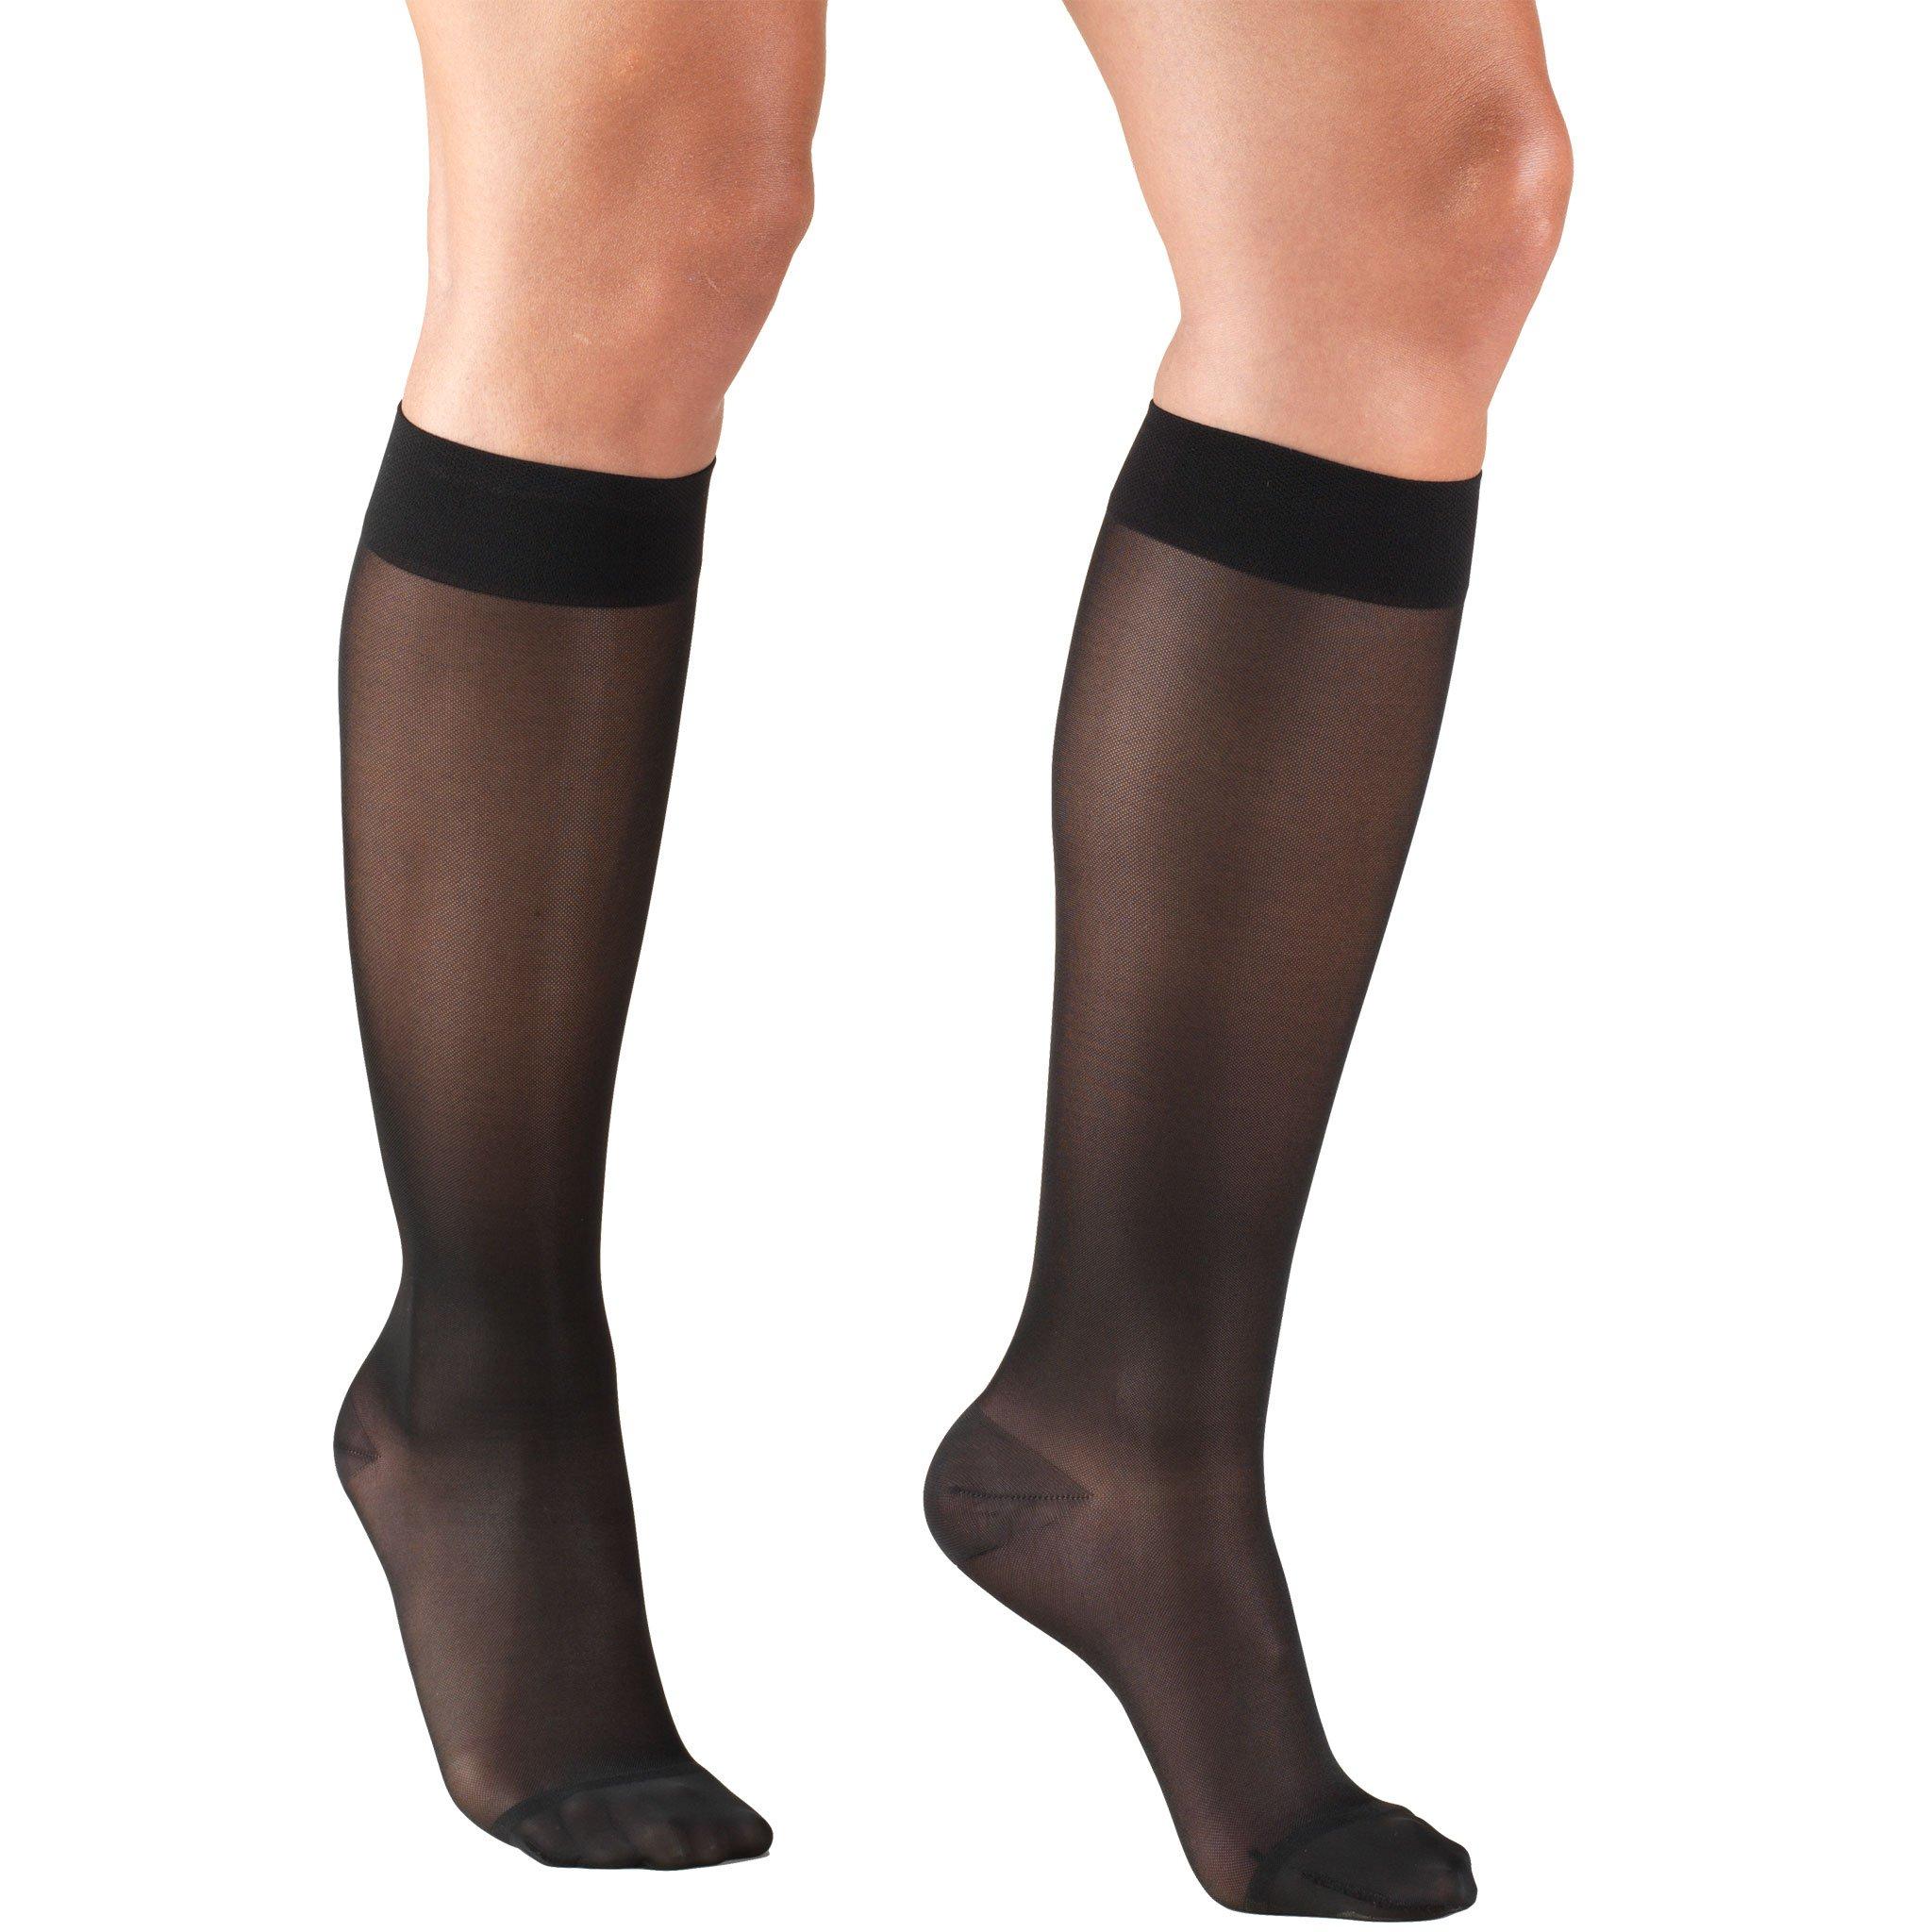 Truform Compression Stockings, 15-20 mmHg, Sheer, Knee High, Black, Medium